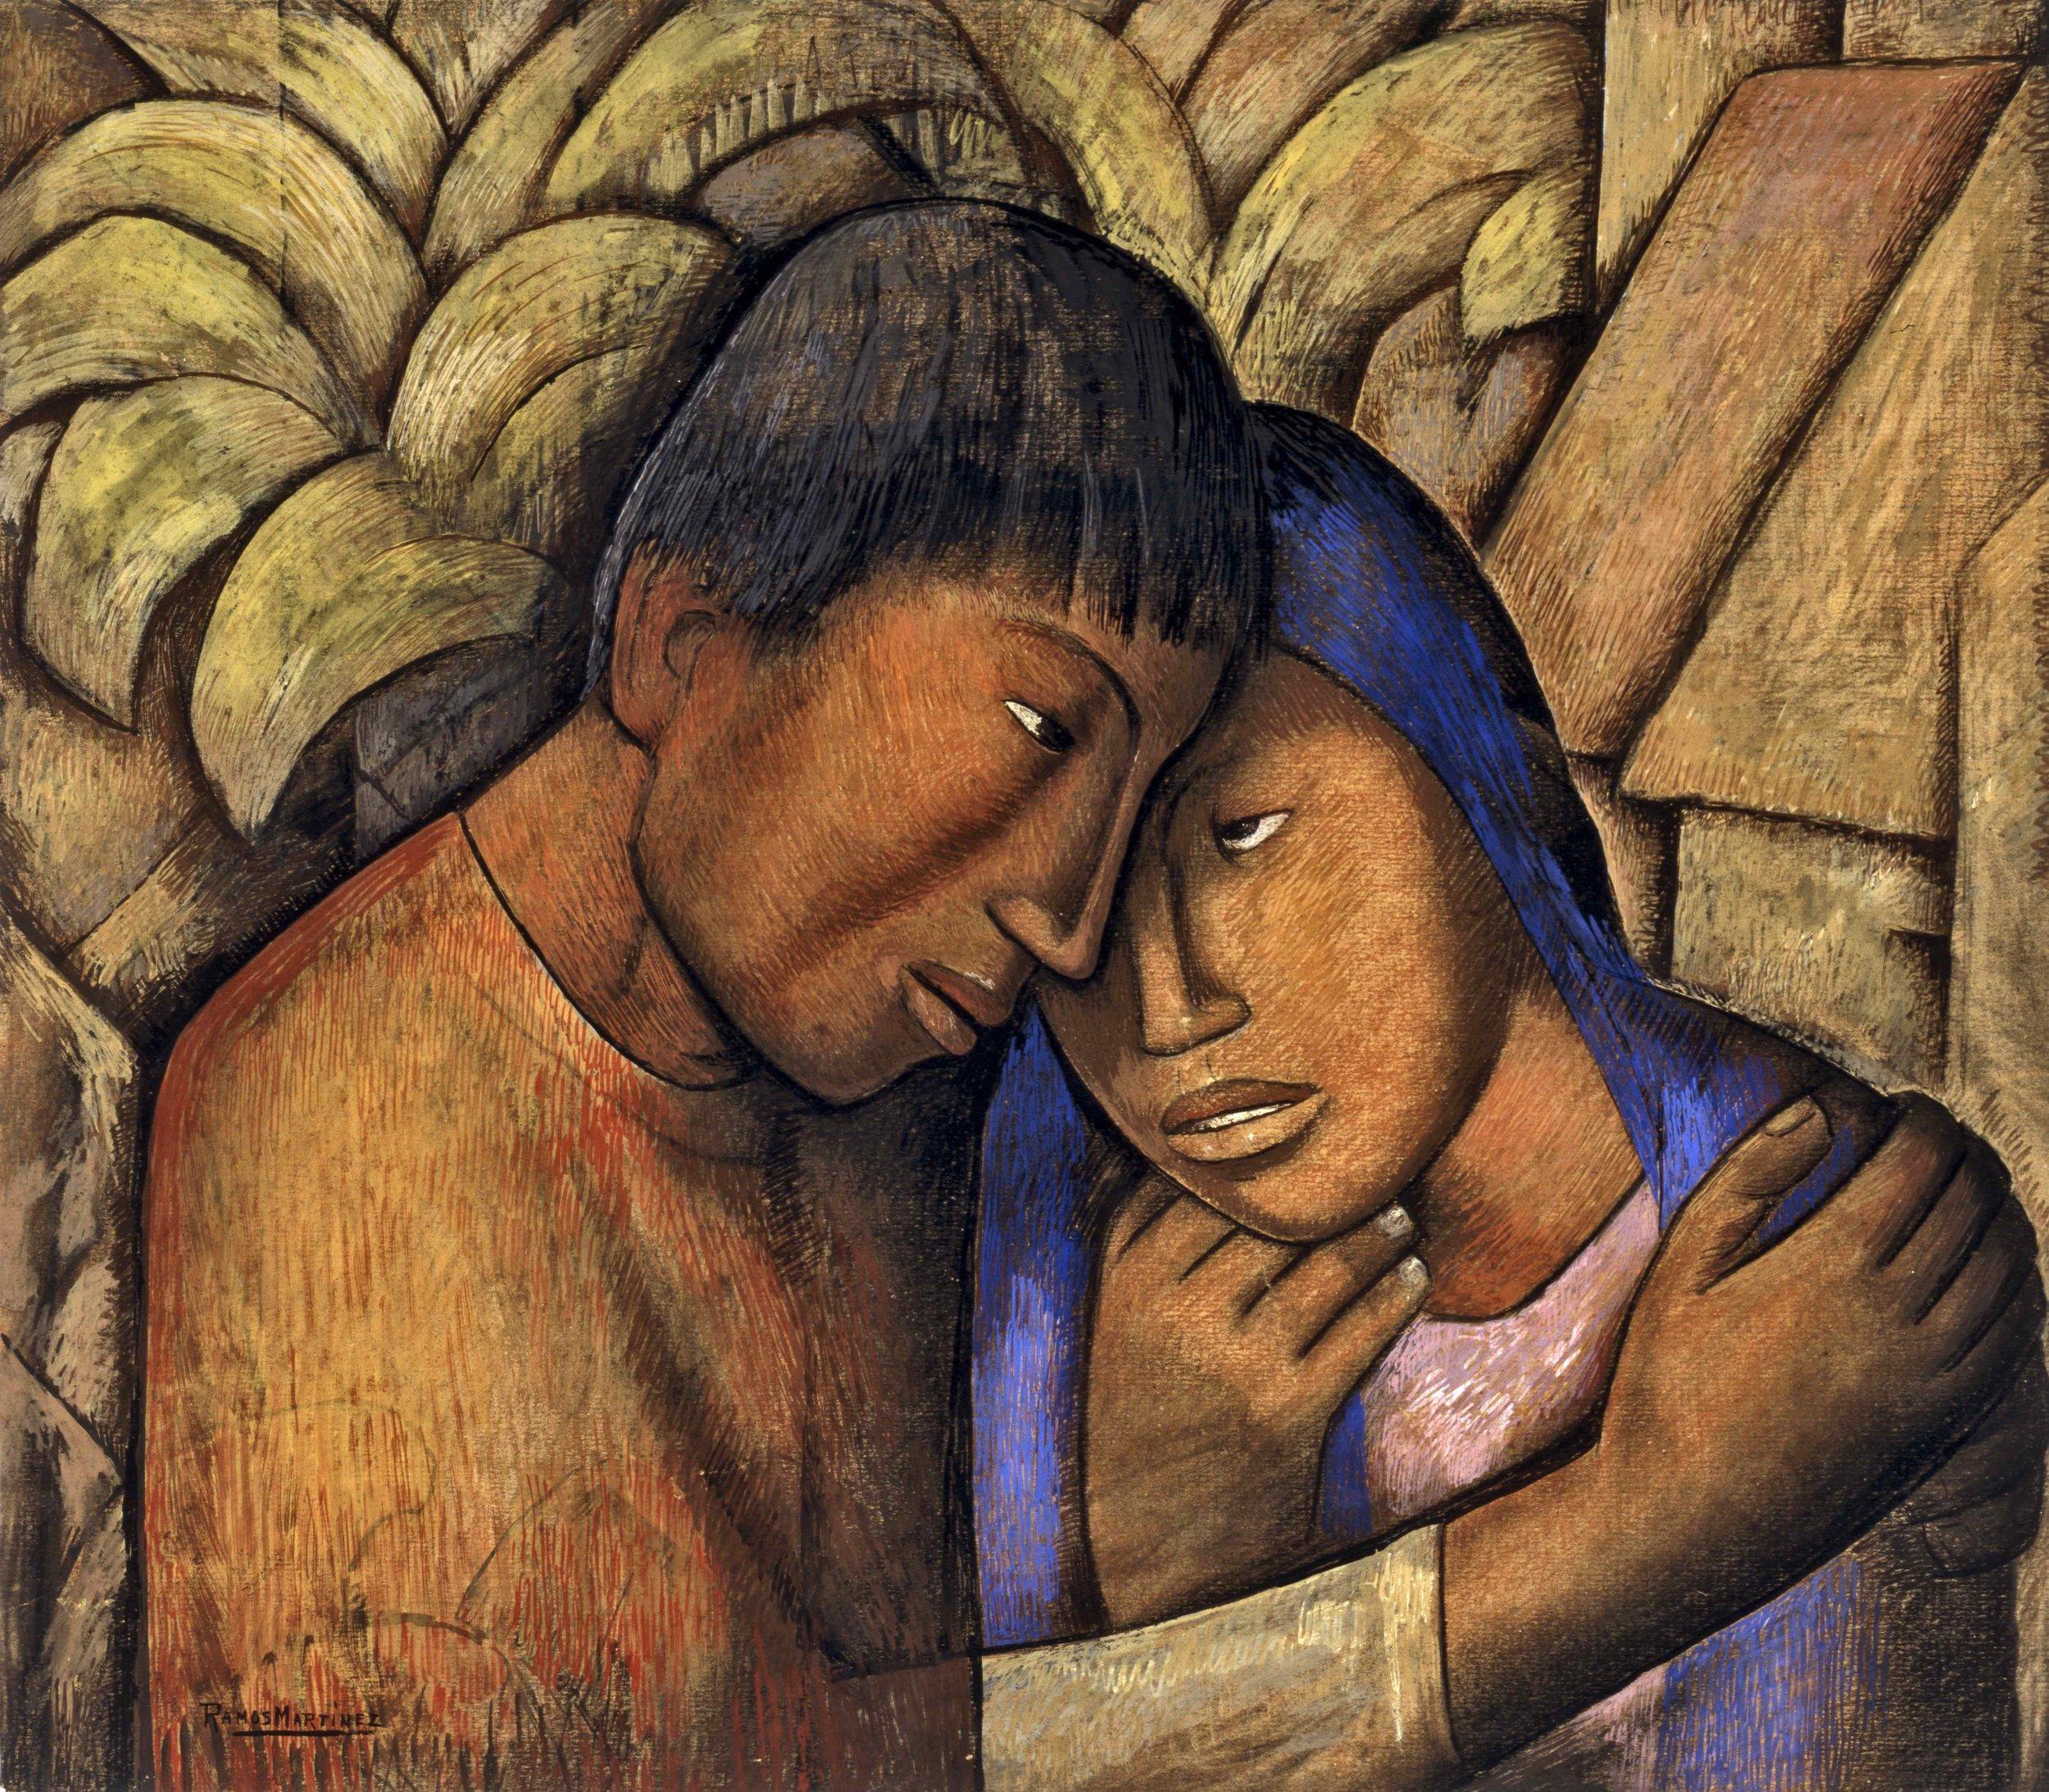 Los Amantes / The Lovers  ca. 1930 watercolor and gouache on paper / acuarela y aguada sobre papel 22.8 x 25.6 inches / 57.8 x 65.1 centímetros Santa Barbara Museum of Art